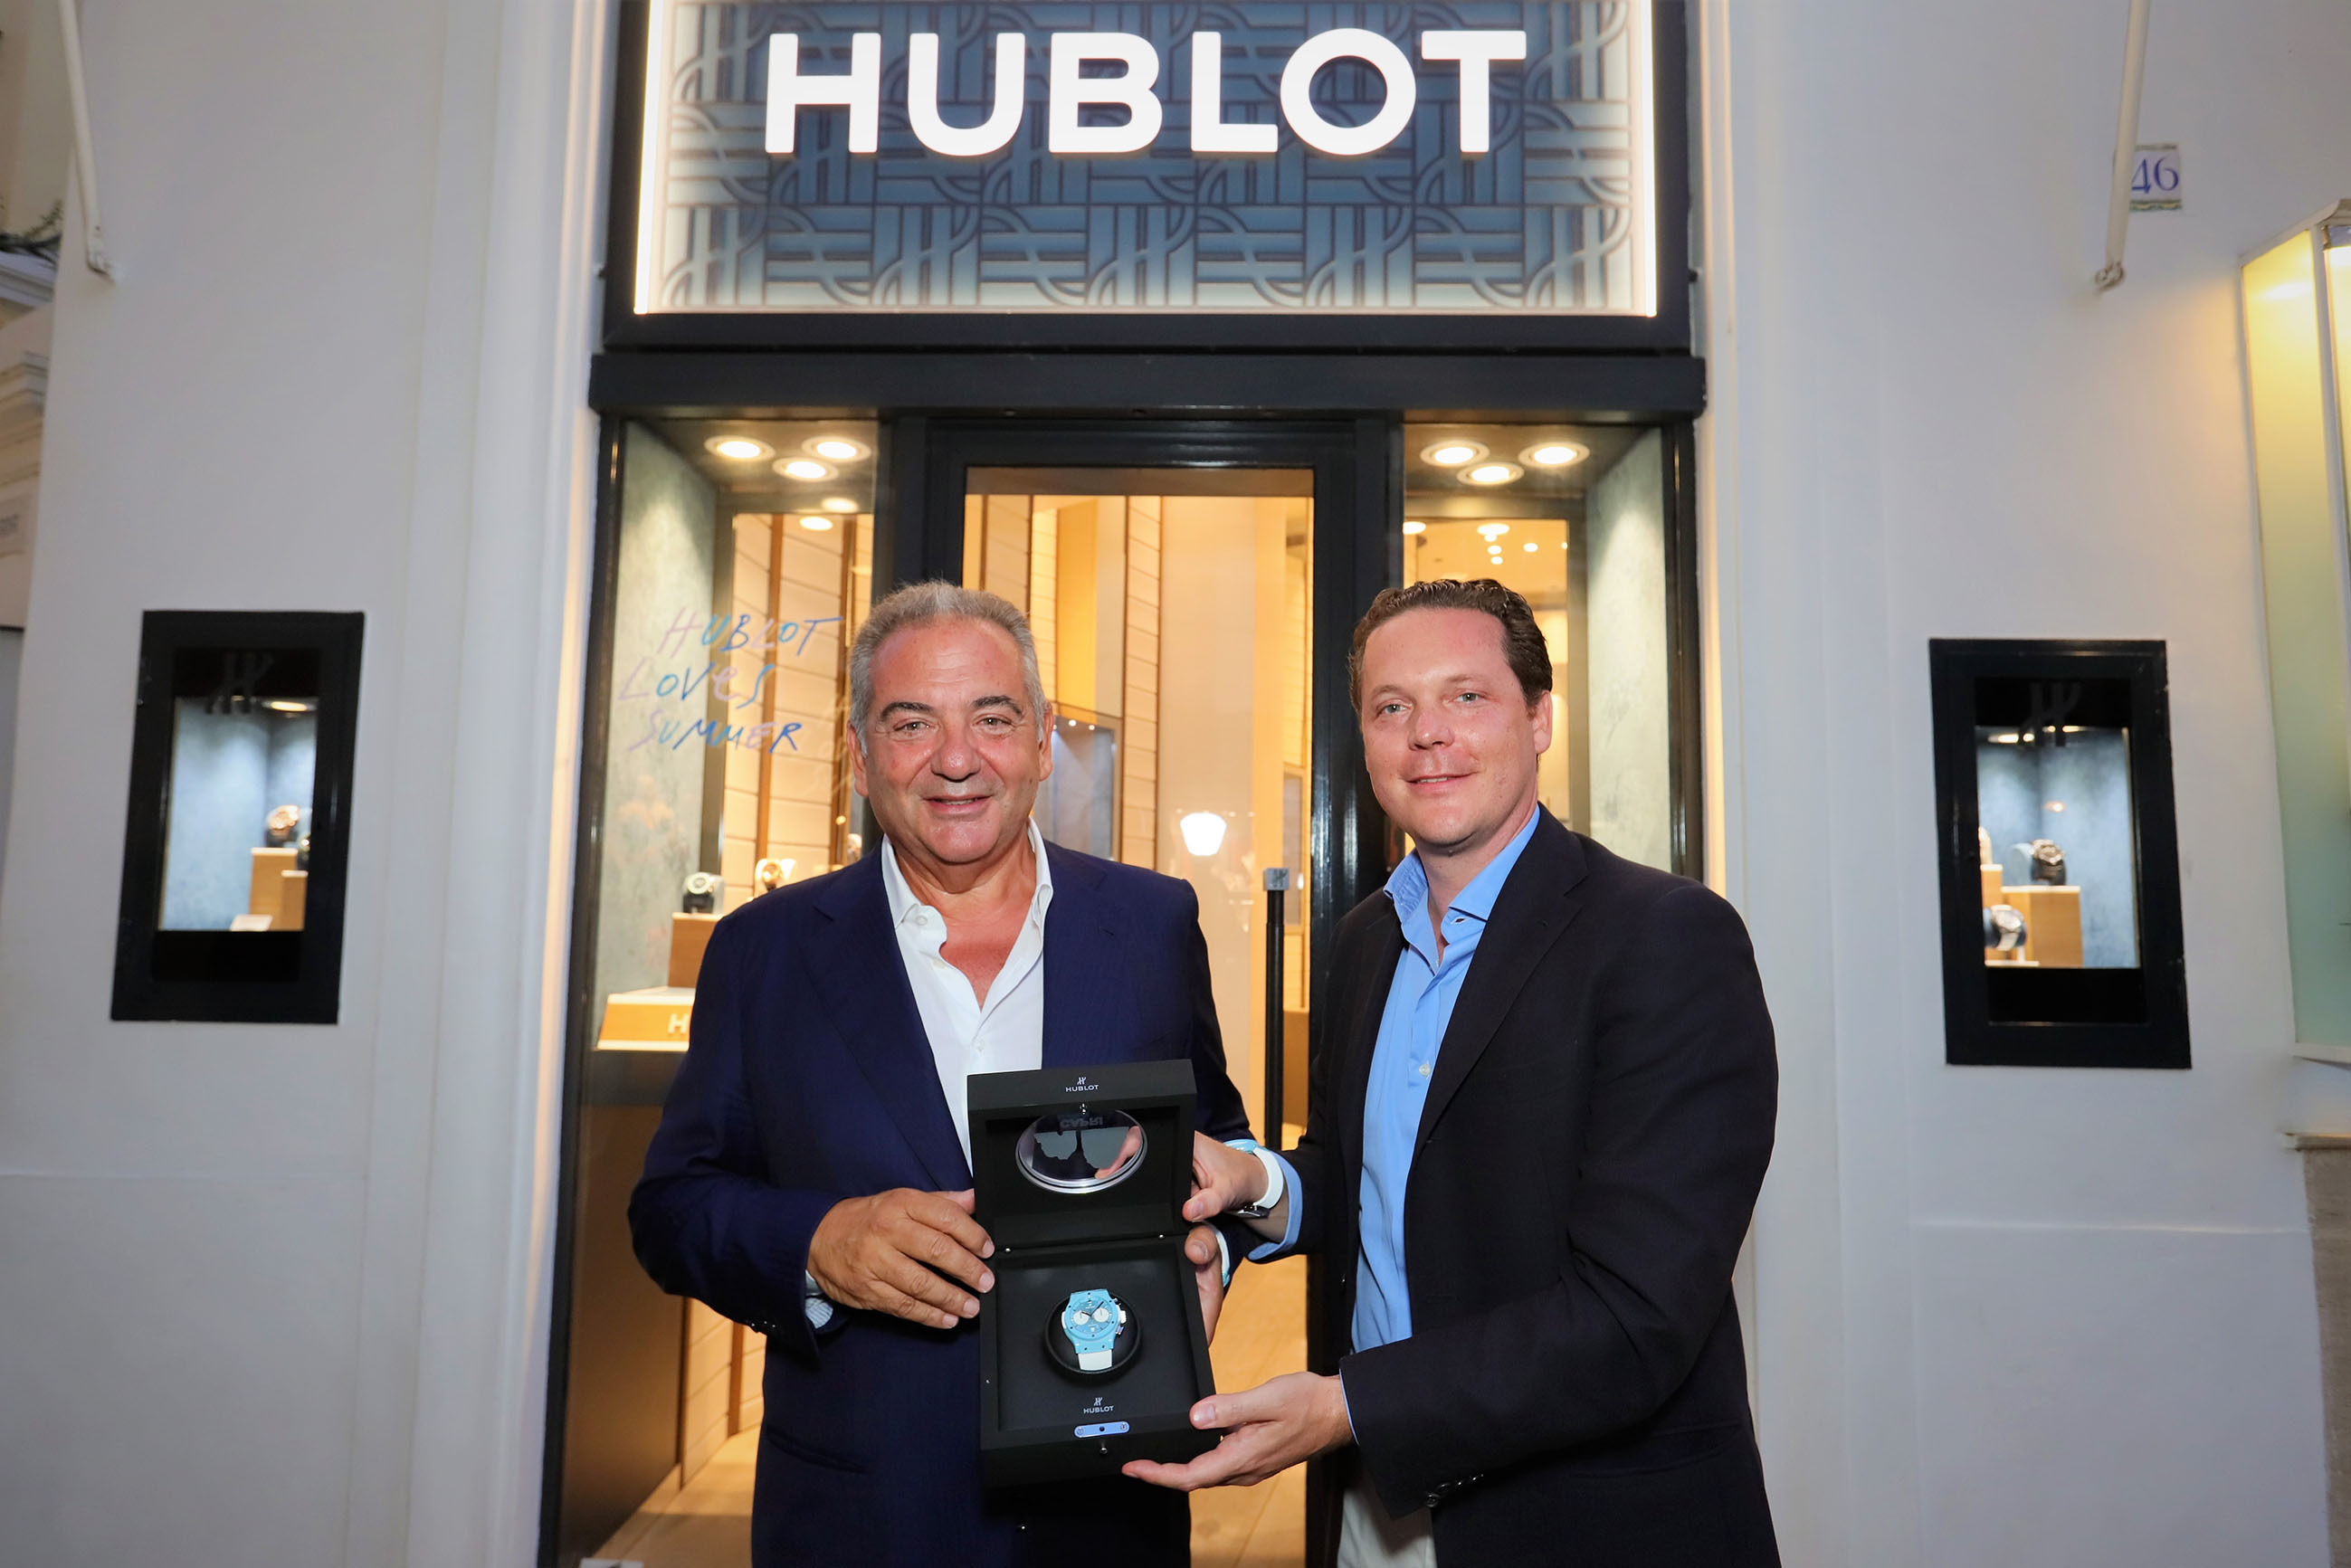 Hublot Classic Fusion Capri 2019